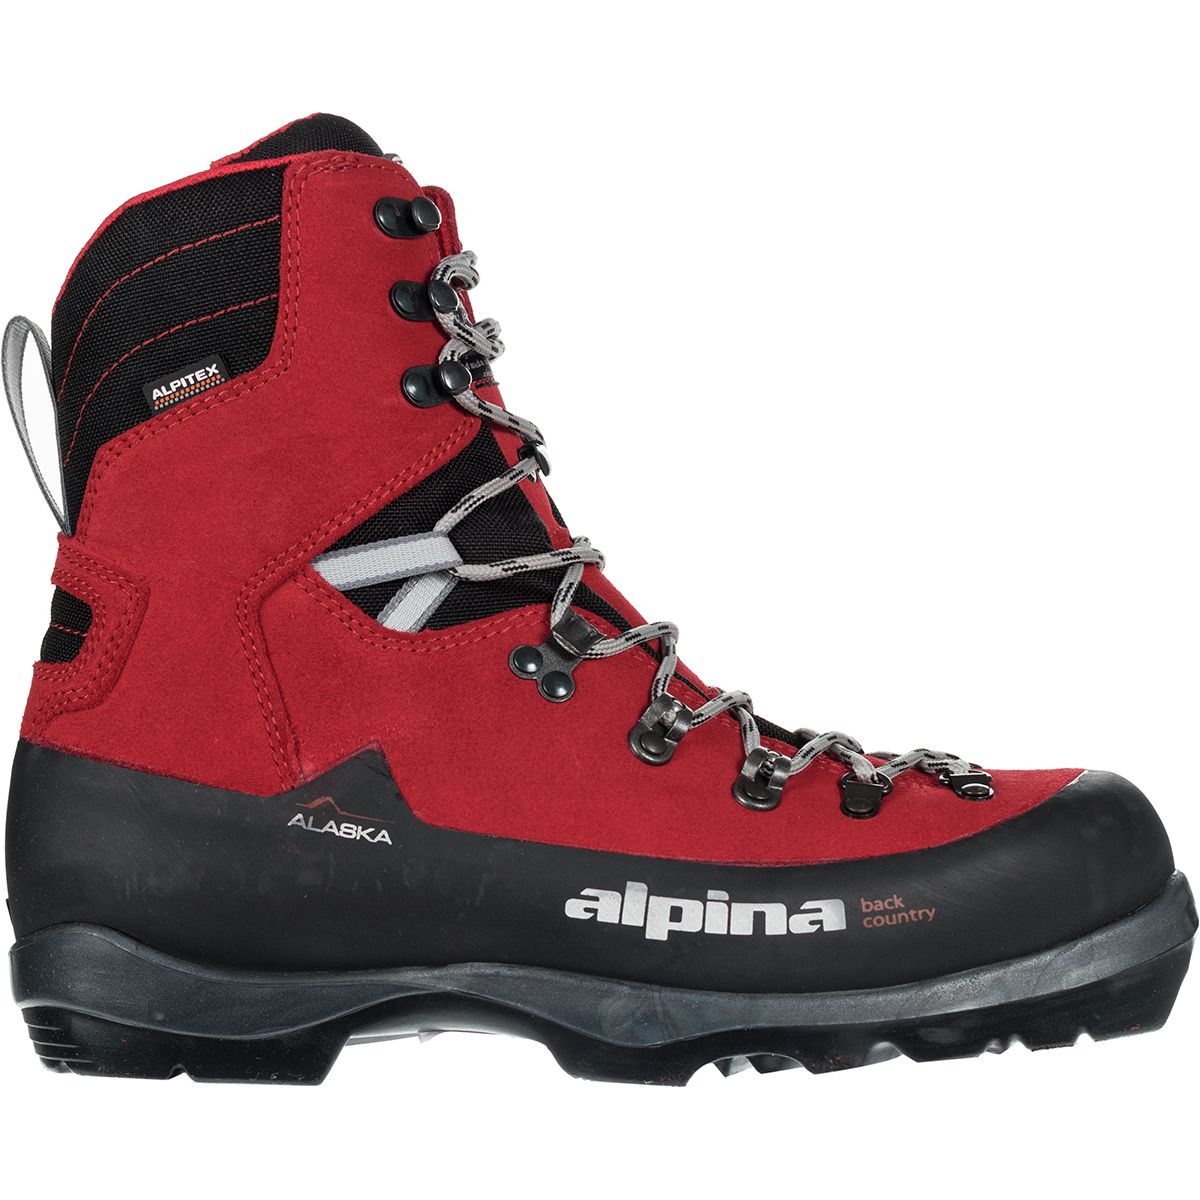 photo of a ski boot